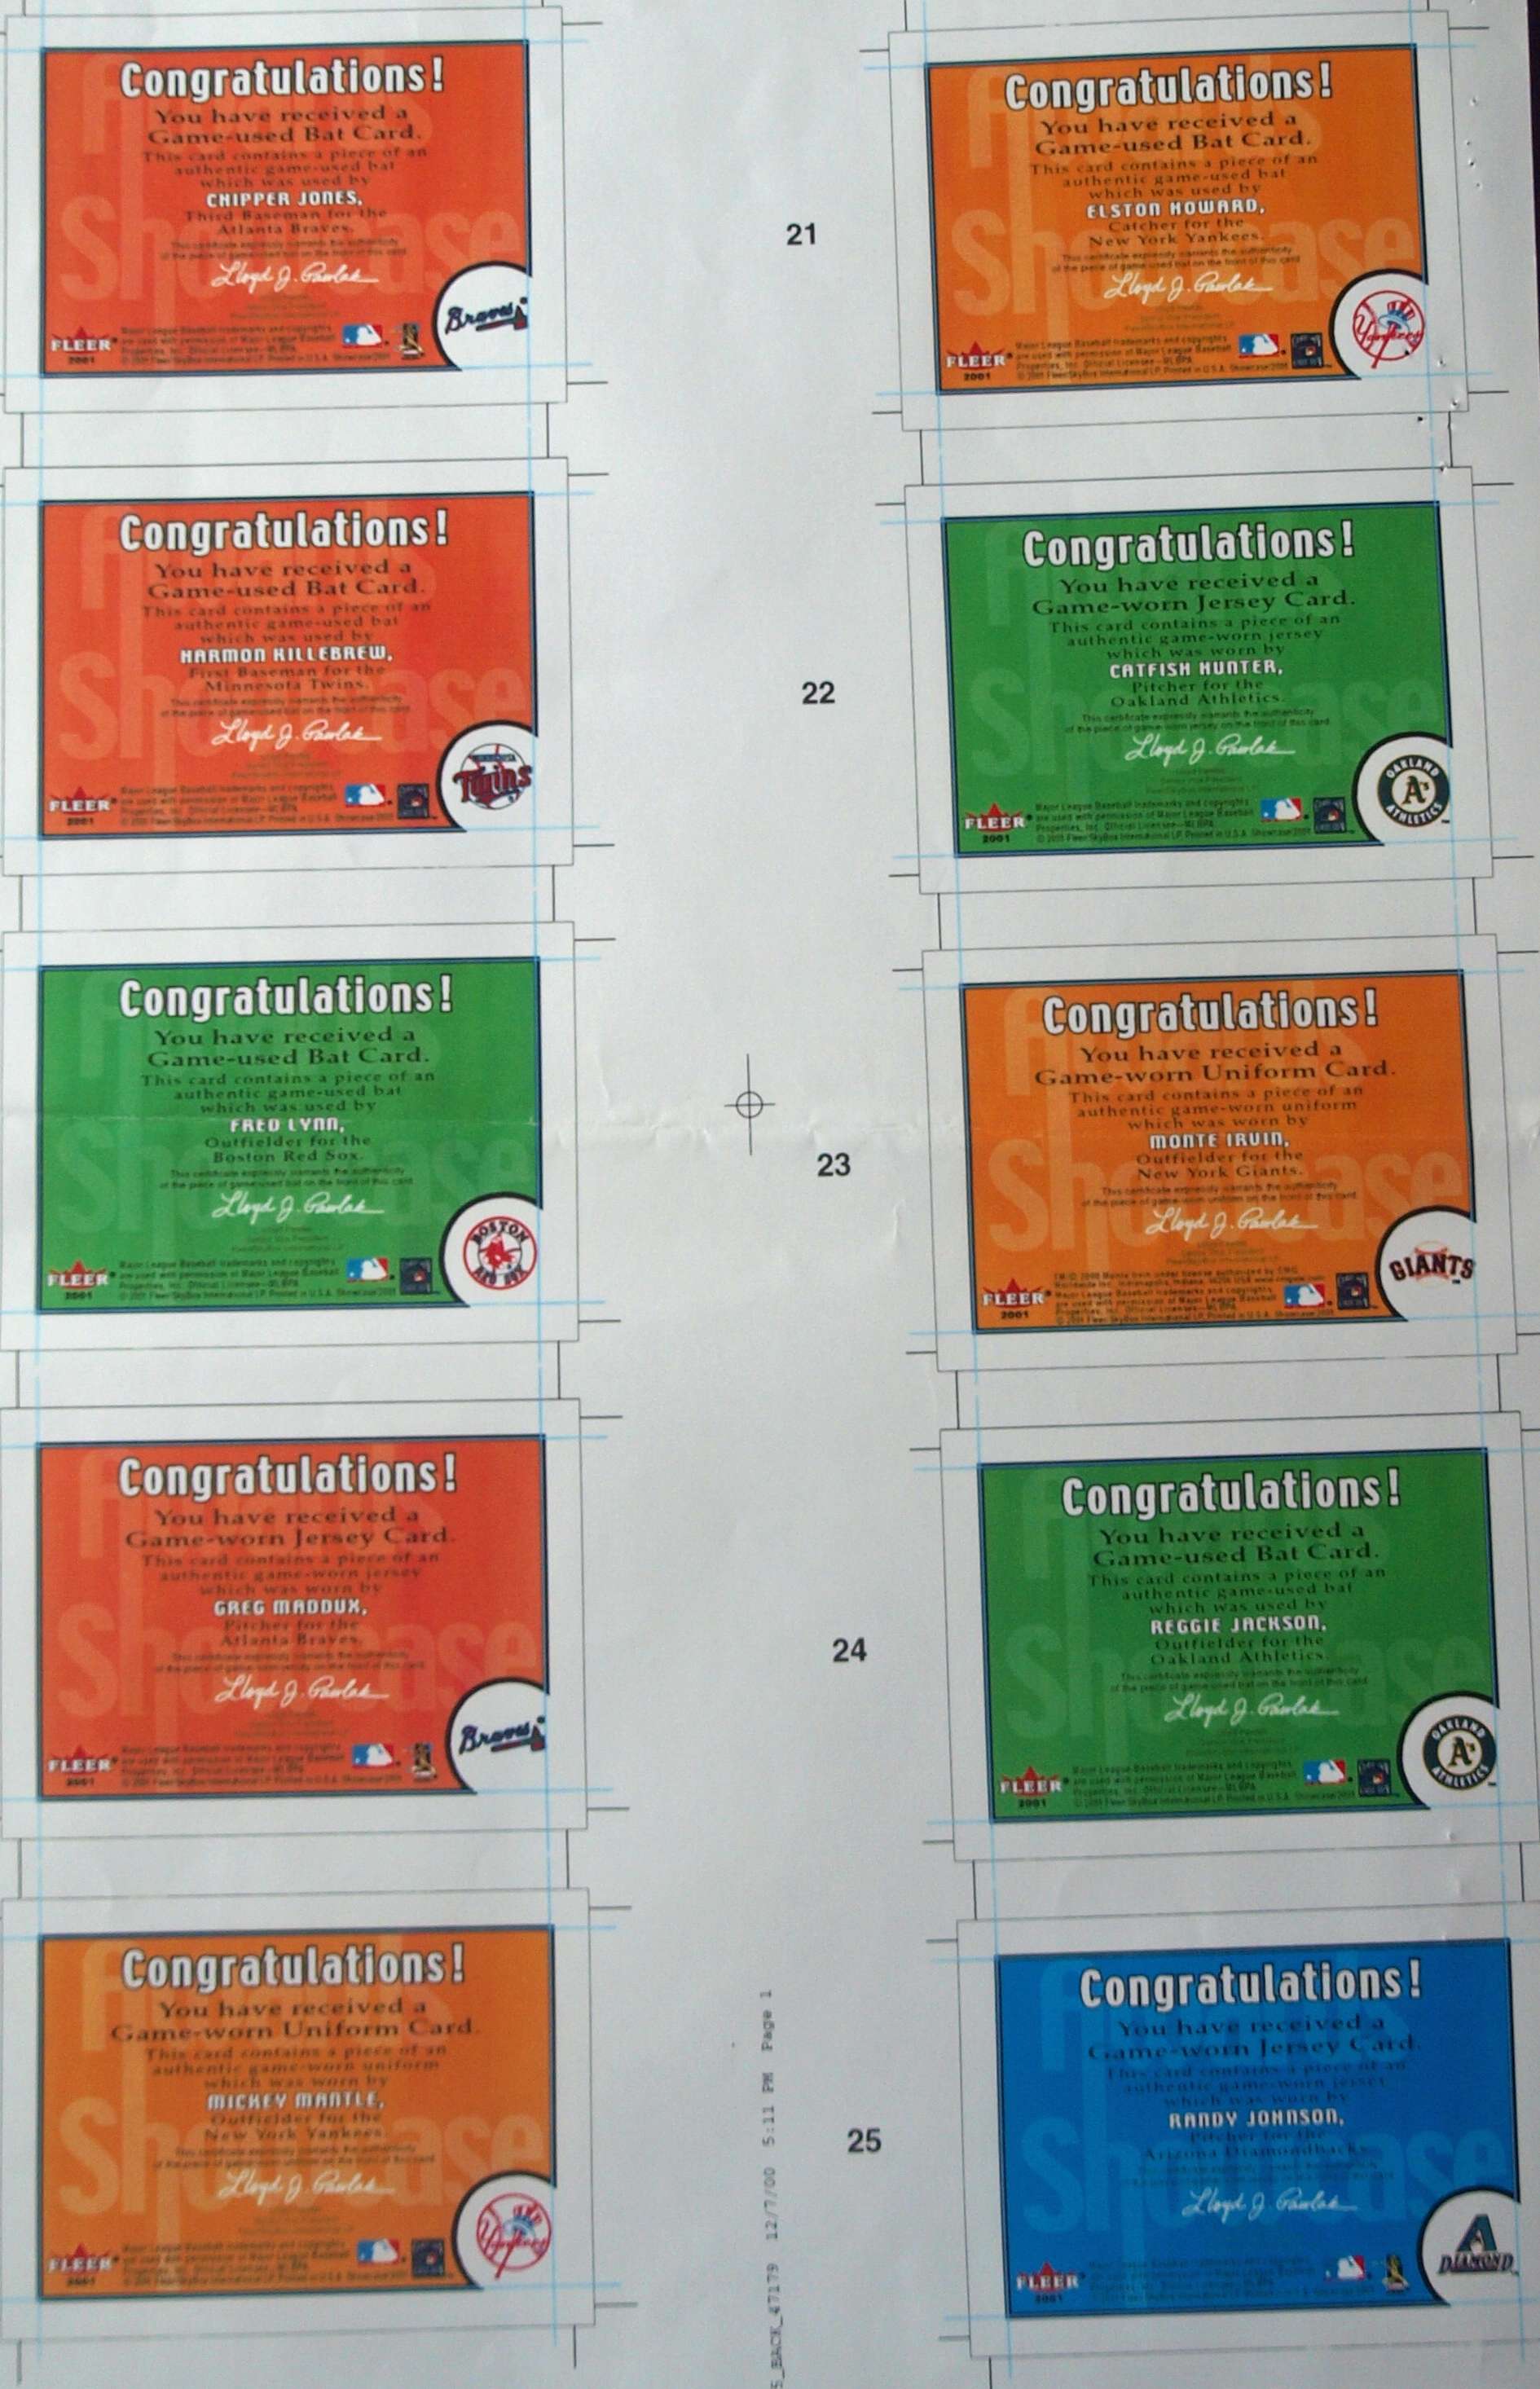 2000 fleer test card, never produced